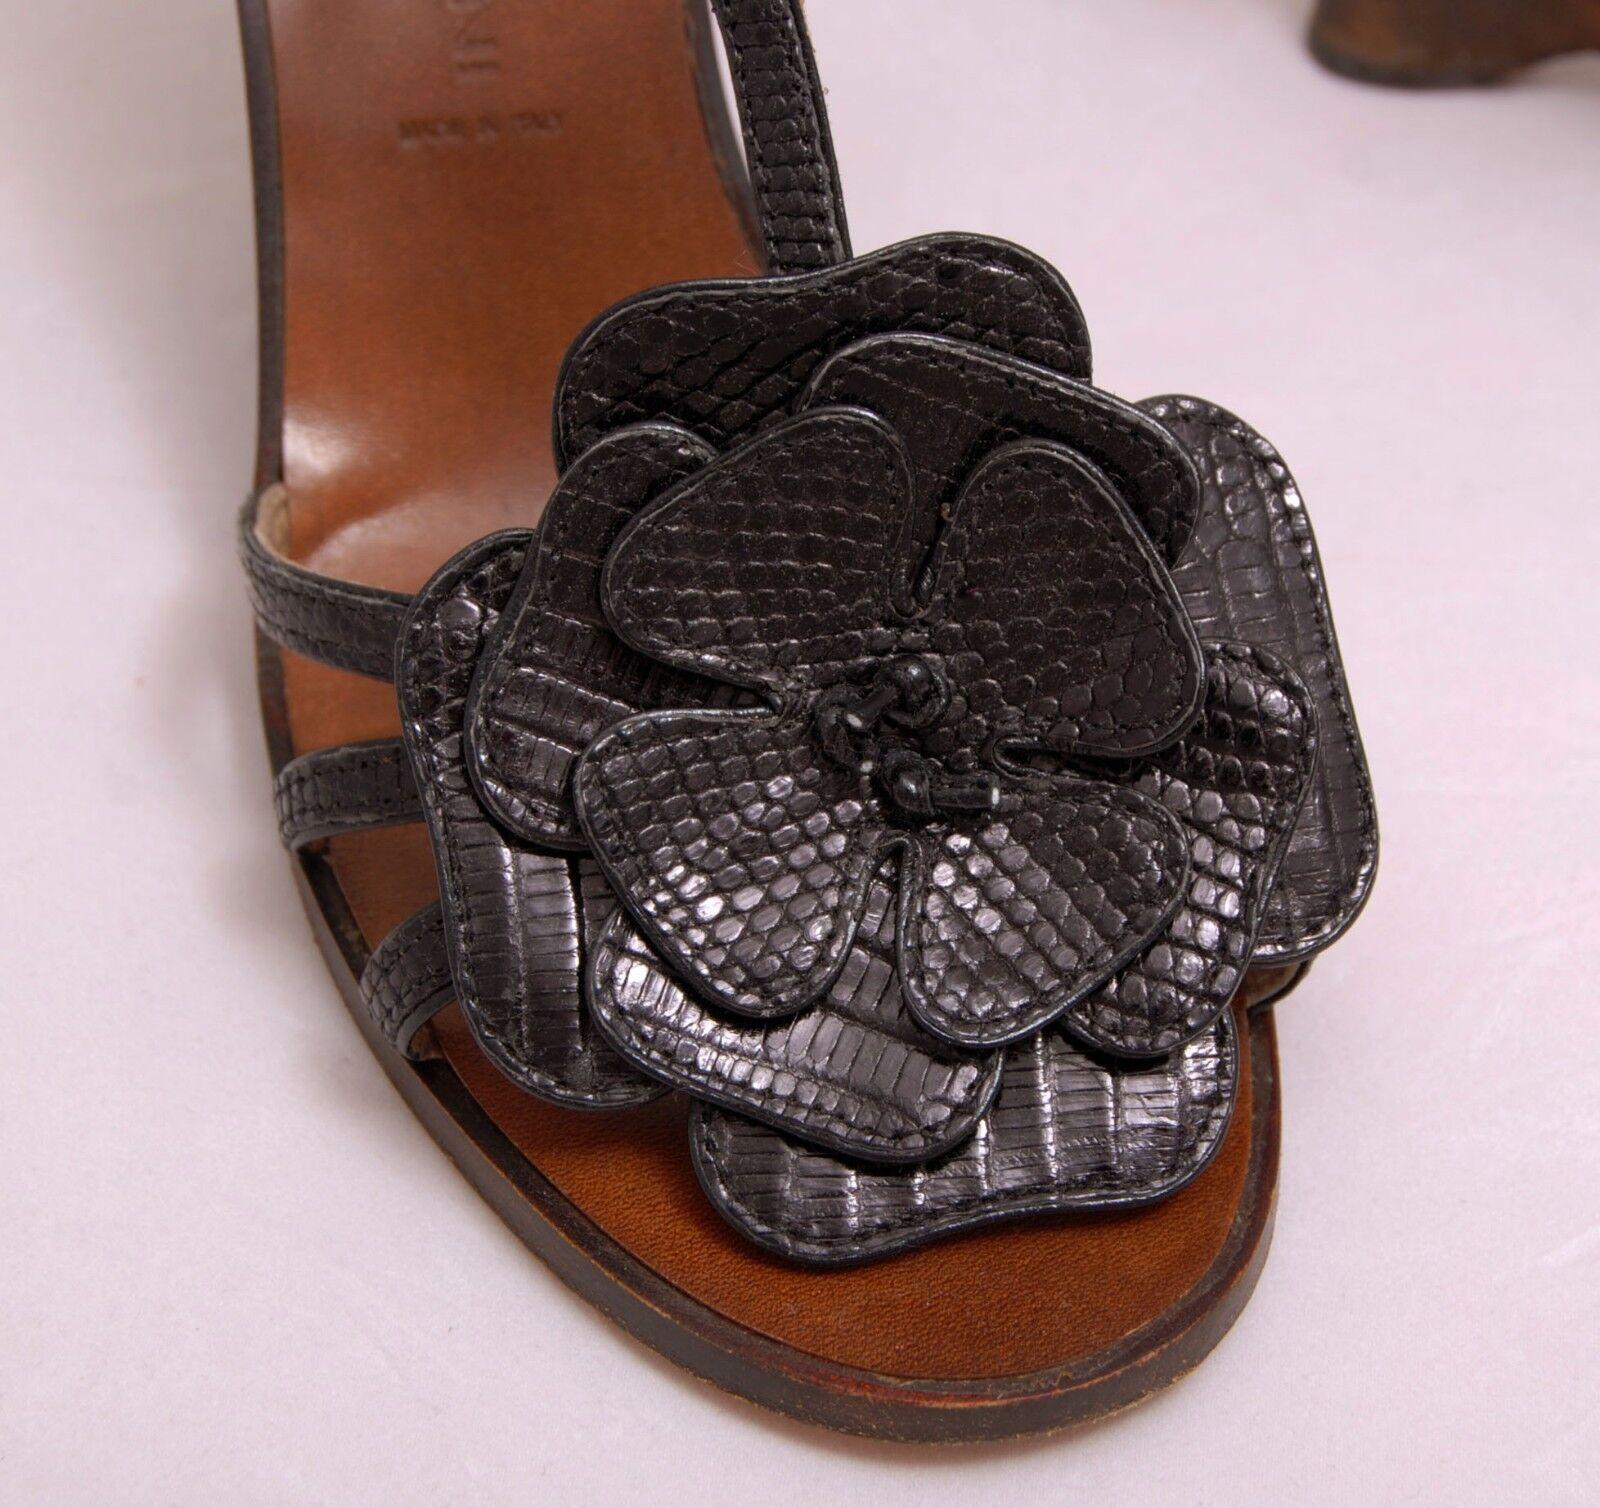 Boccaccini Black Lizard Embossed Embossed Embossed Leather Wedge Heel Italian Sandals, 39.5 US 8.5 5652b2